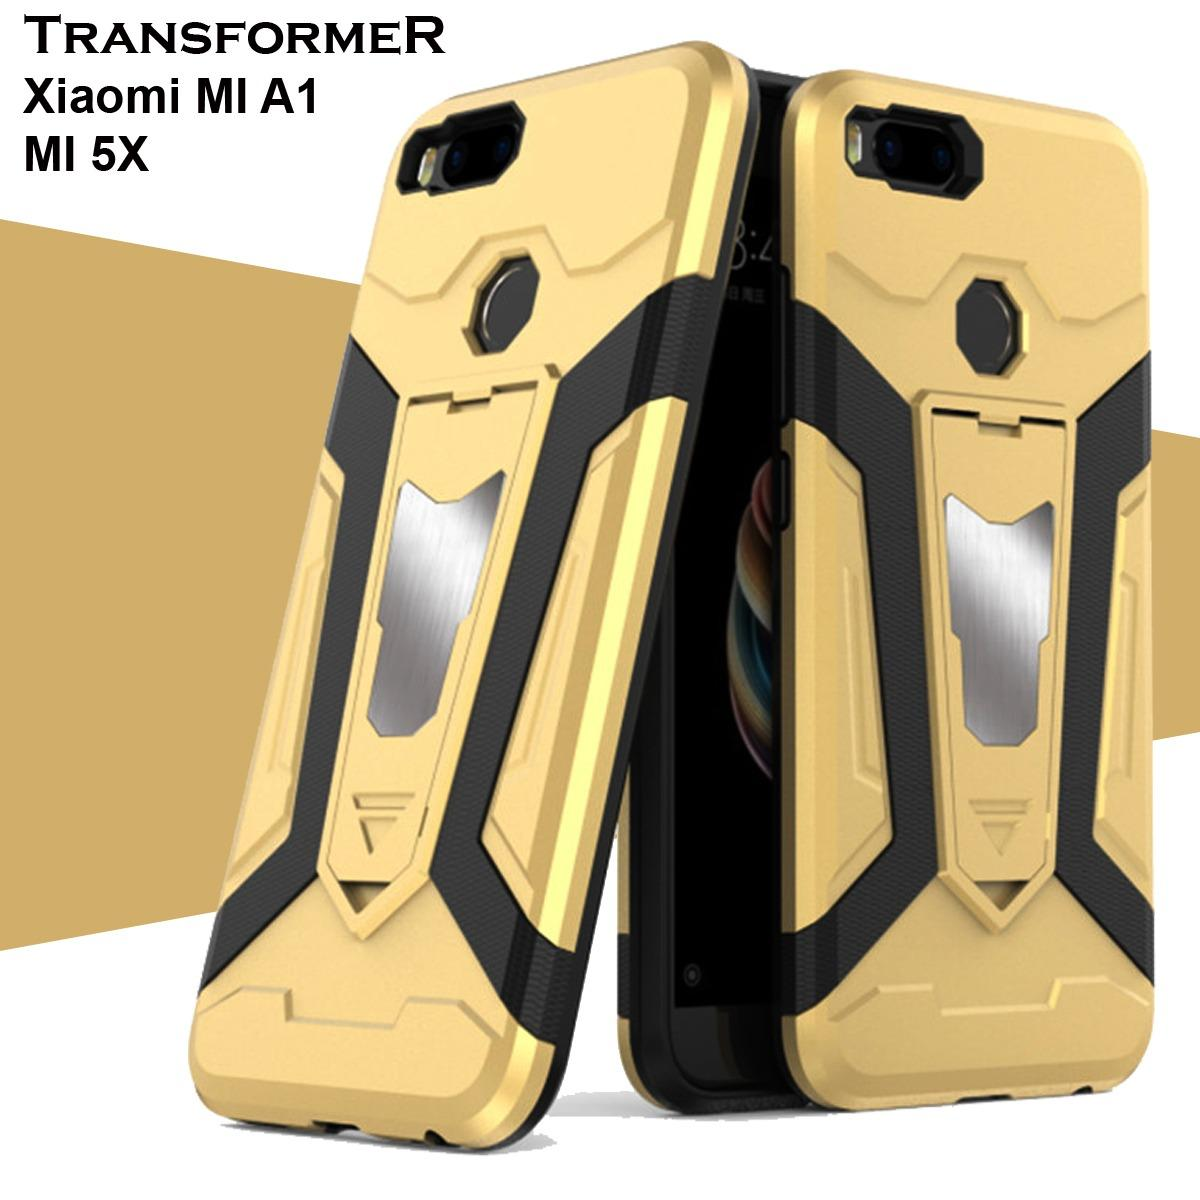 Case Iron Man for Xiaomi Mi A1 / Mi 5X / A1 Robot Transformer Ironman Limited